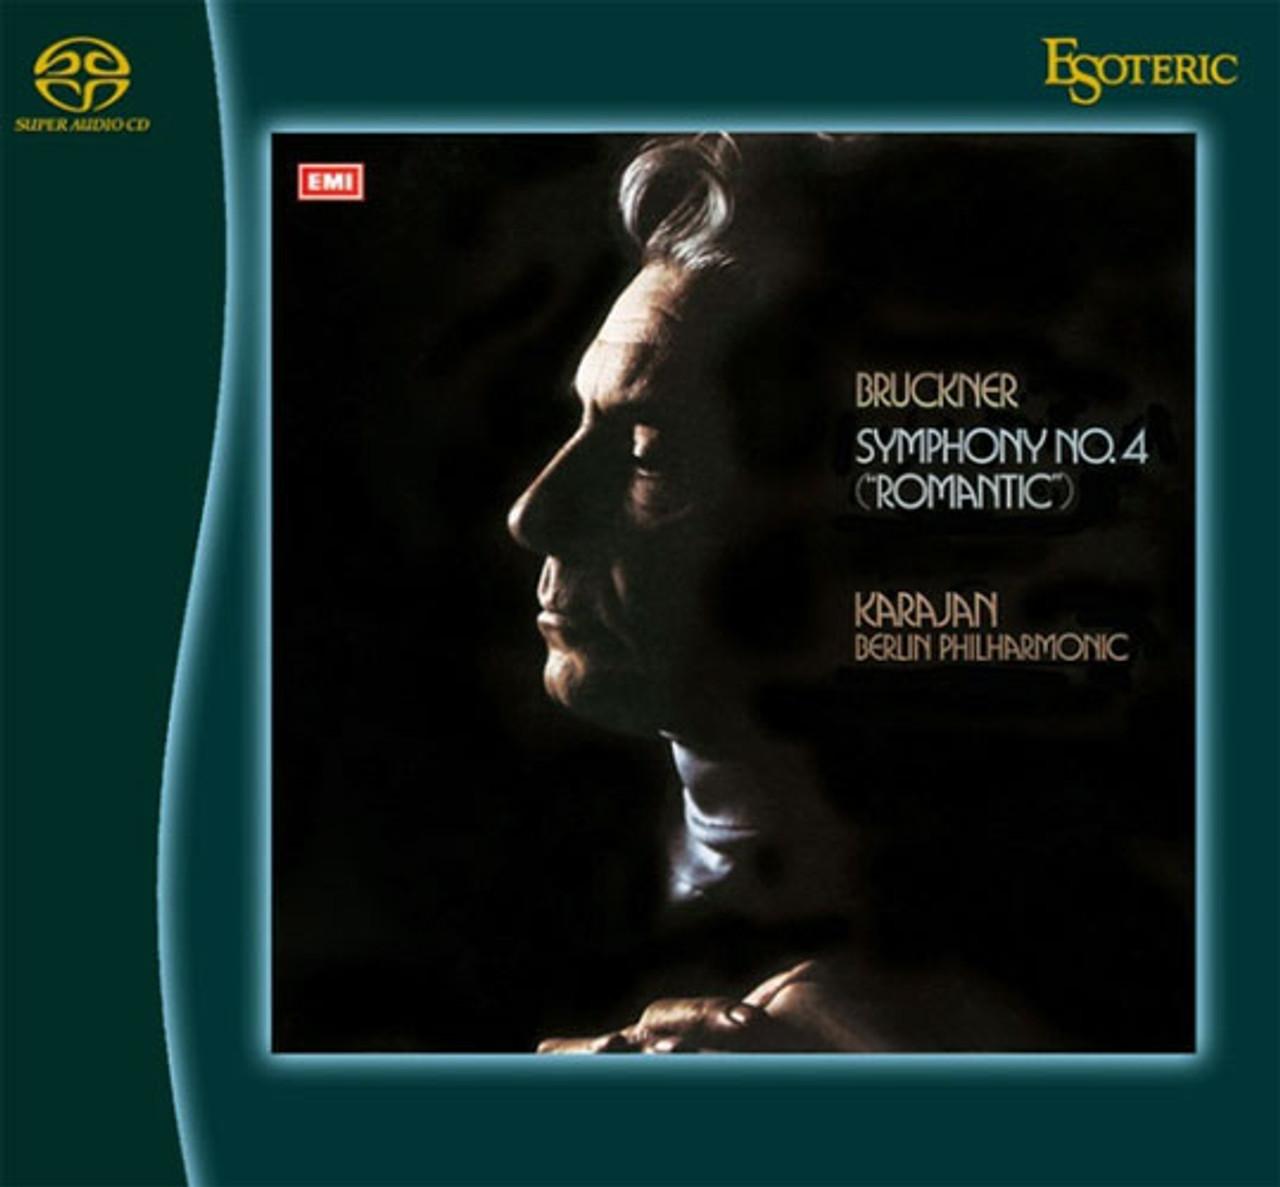 Bruckner - Symphony No. 4 Esoteric SACD